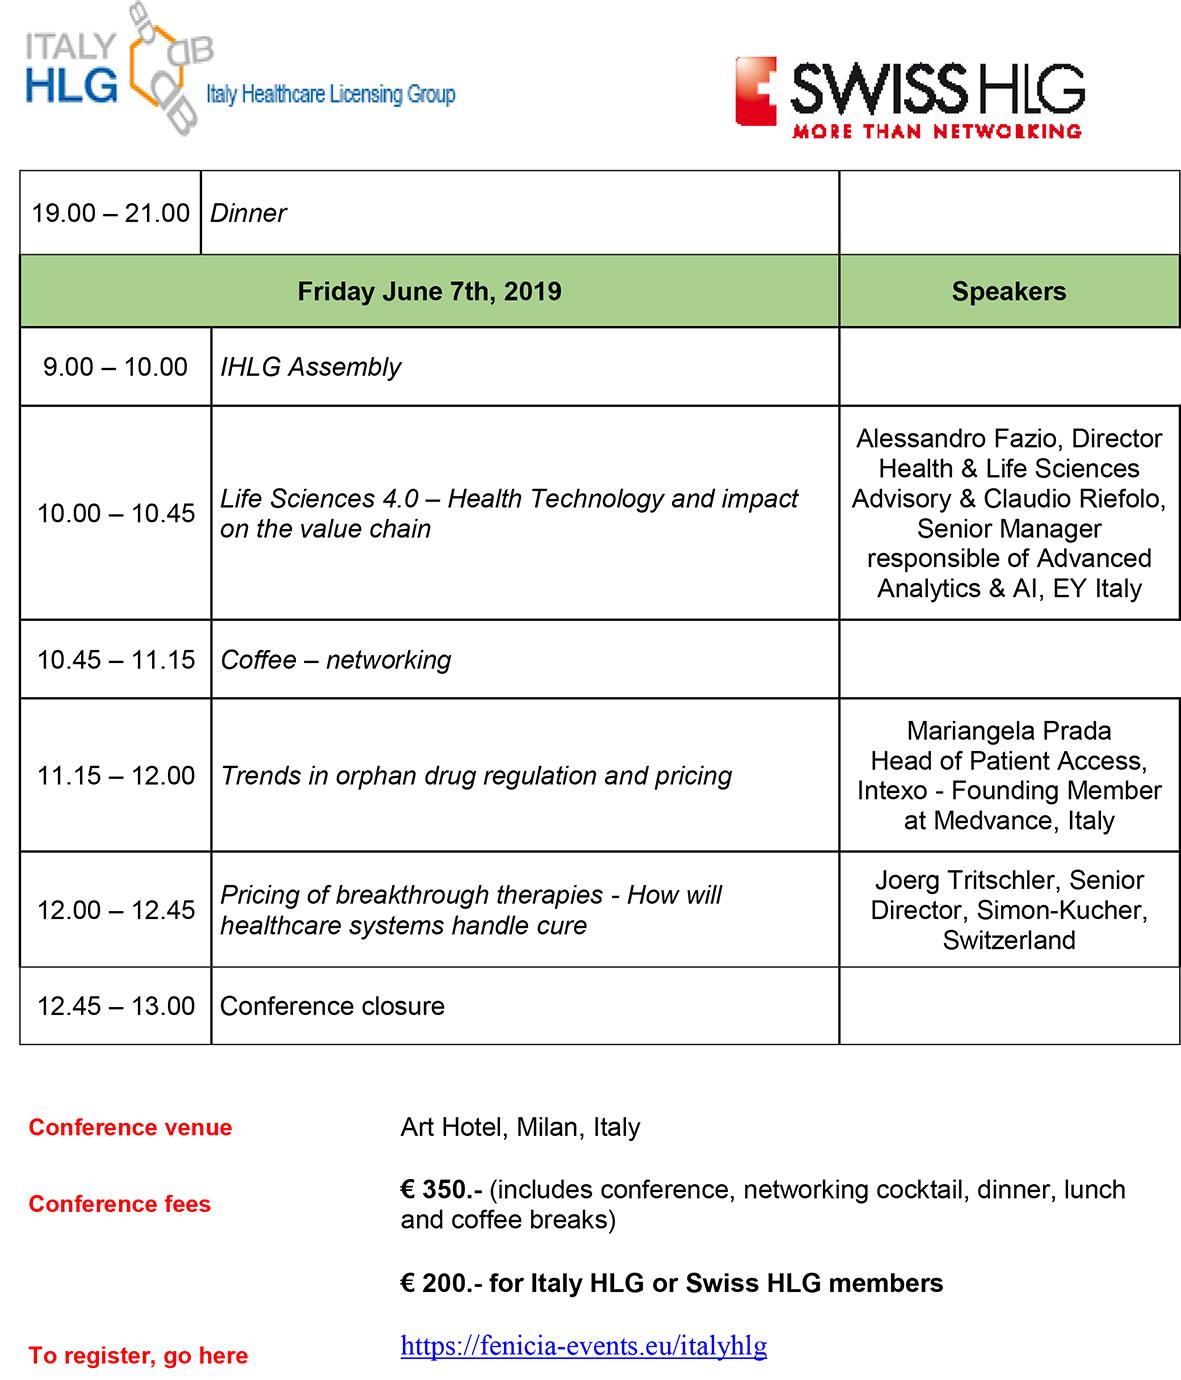 IHLG-SHLG Milan conference program22019-2 - Swiss Healthcare